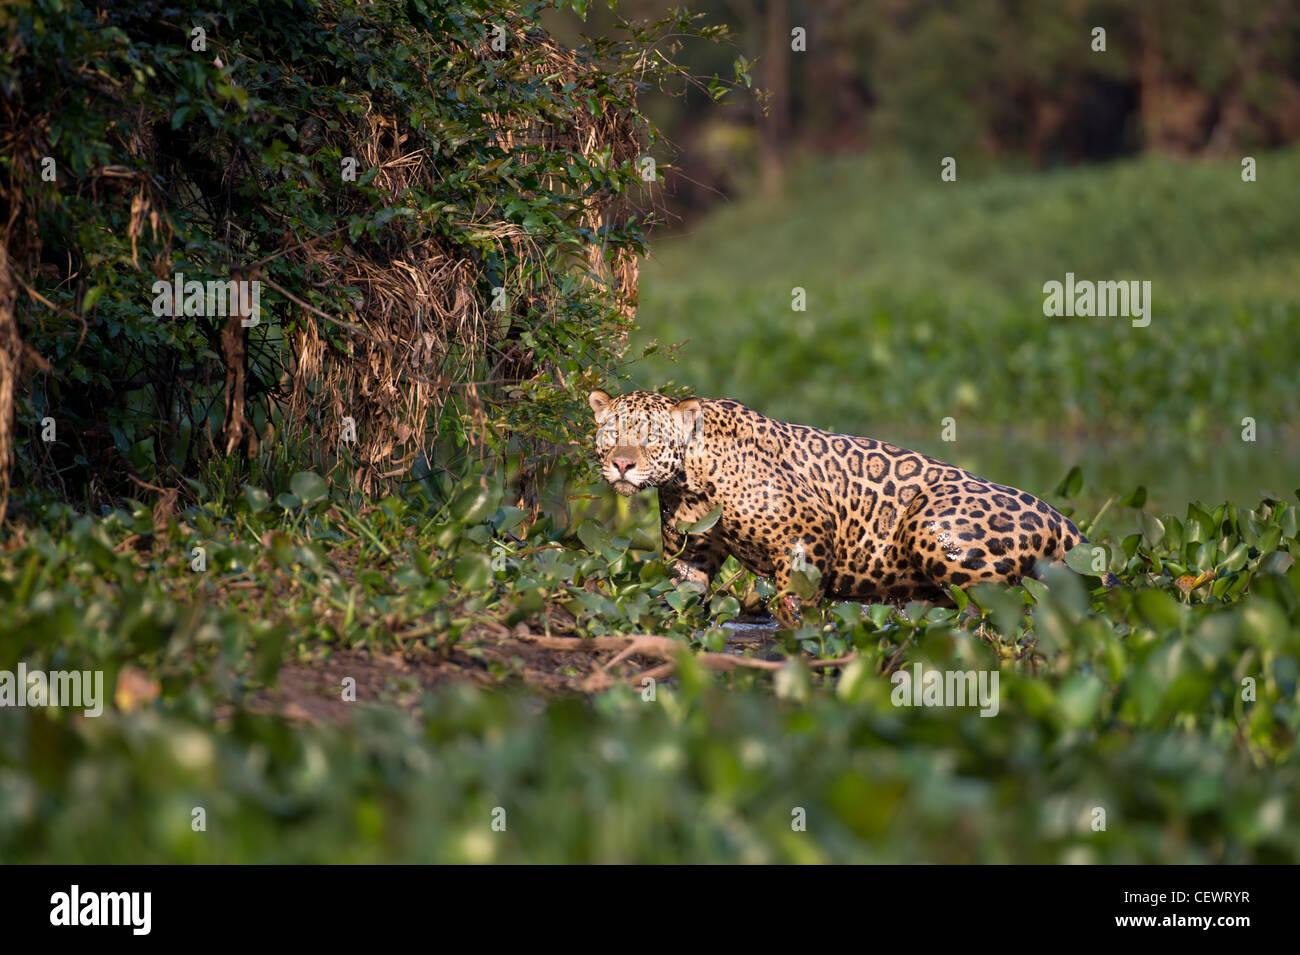 Wilde männliche Jaguar aus Wasserhyazinthe am Rande der ein Nebenfluss des Cuiaba Fluss, nördliche Pantanal, Stockbild